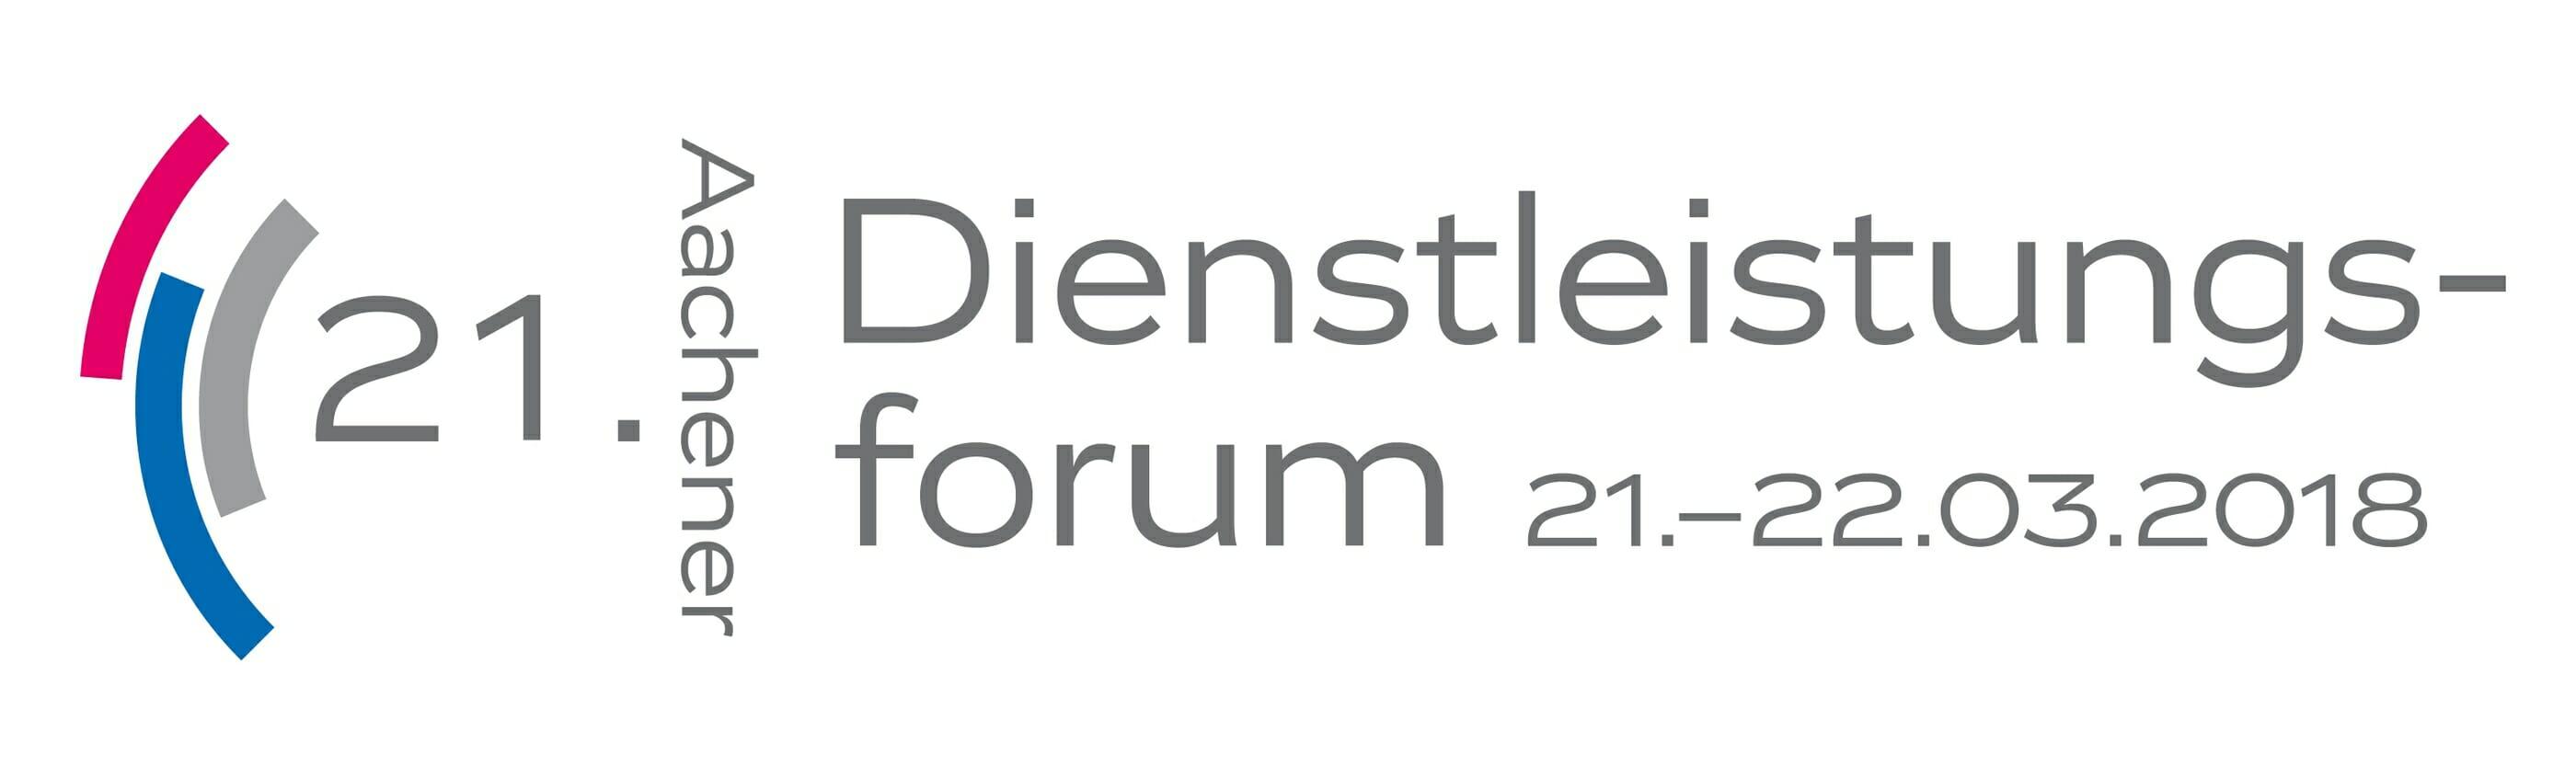 dl-forum_2018_logo_mitdatum_rgb